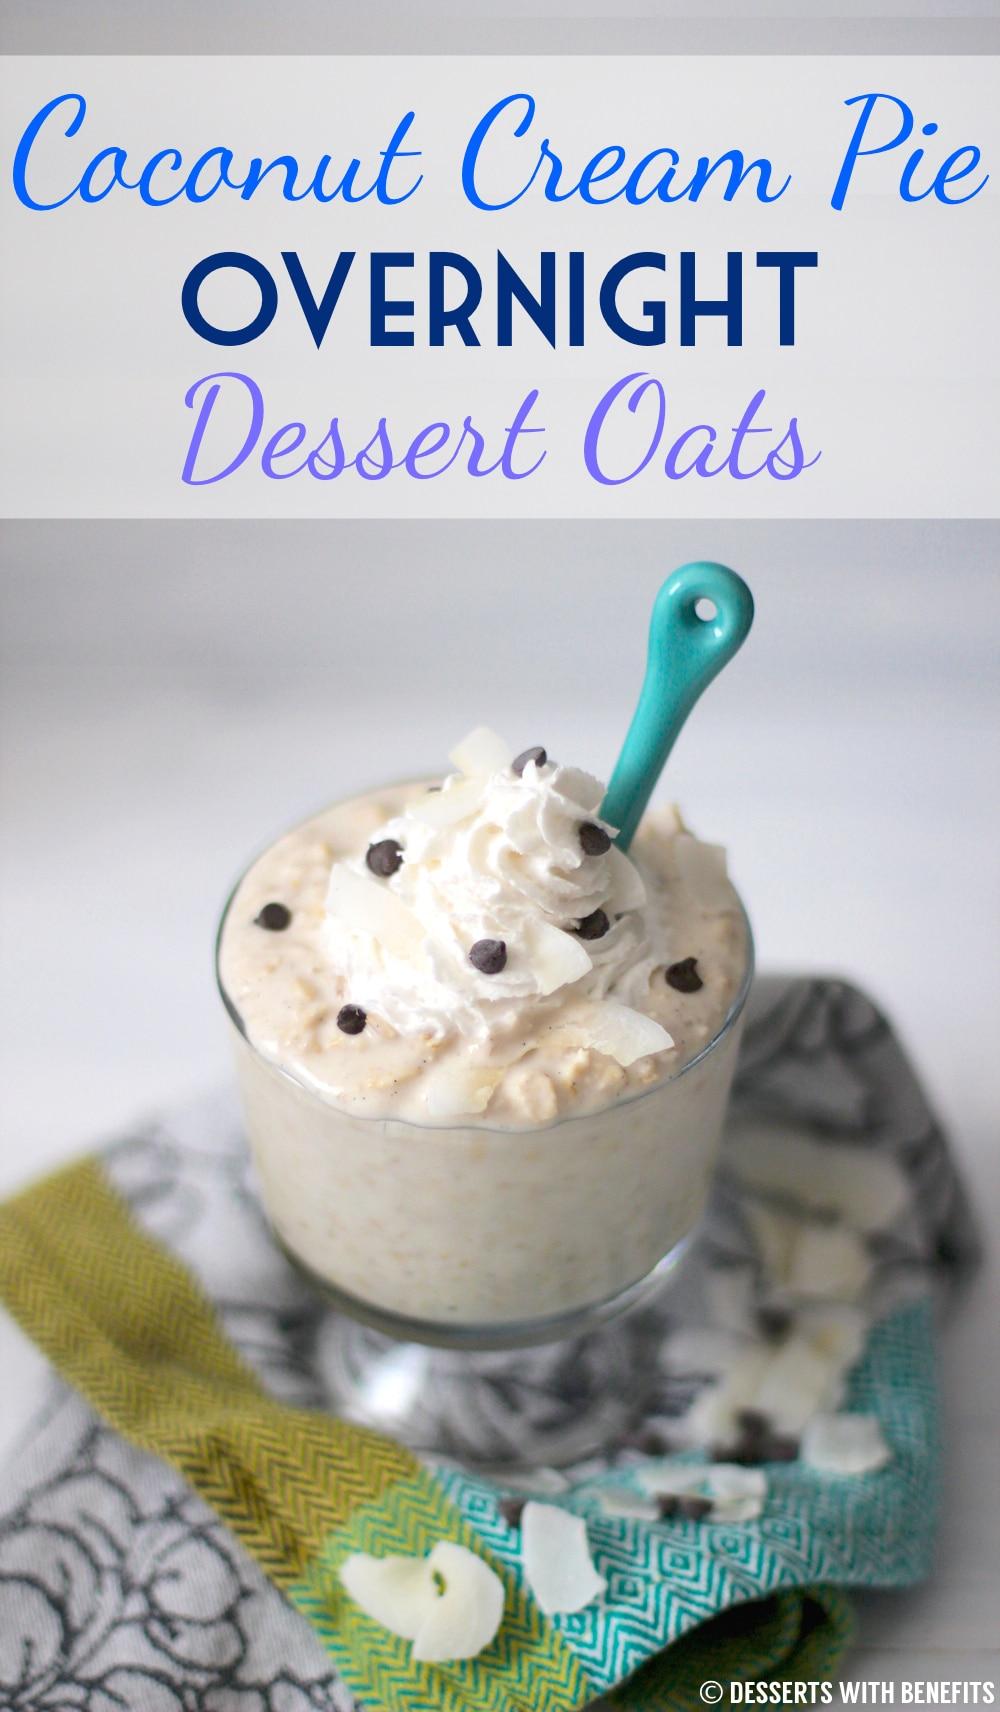 Healthy Coconut Cream Pie Overnight Dessert Oats (refined sugar free, gluten free, vegan) - Healthy Dessert Recipes at Desserts with Benefits